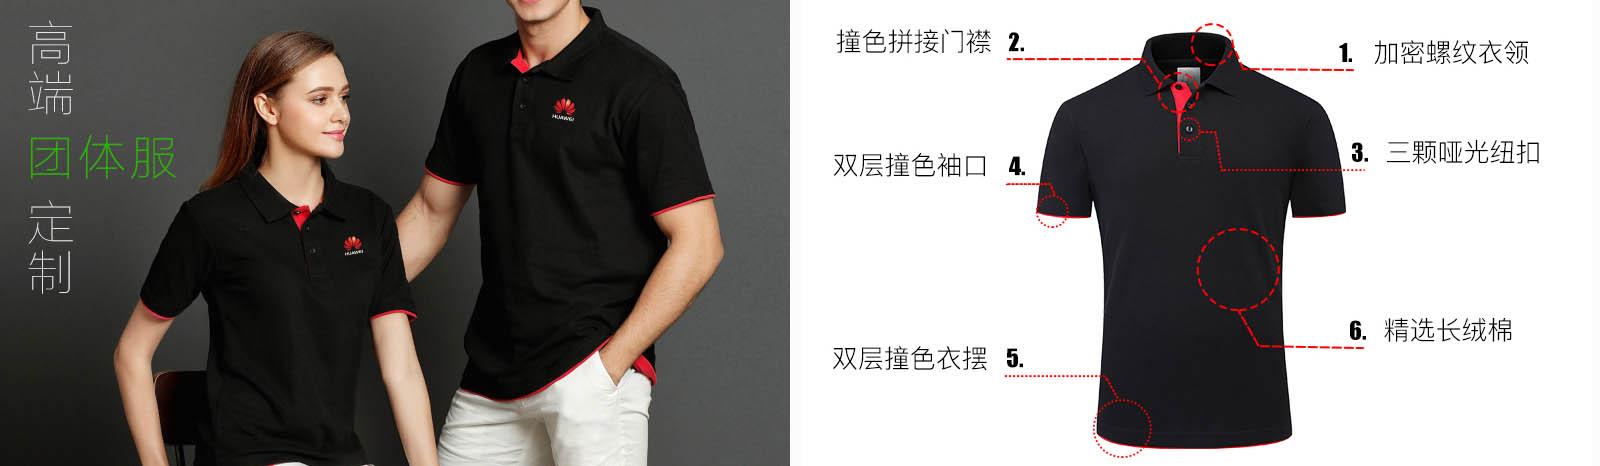 T恤POLO衫工厂货源